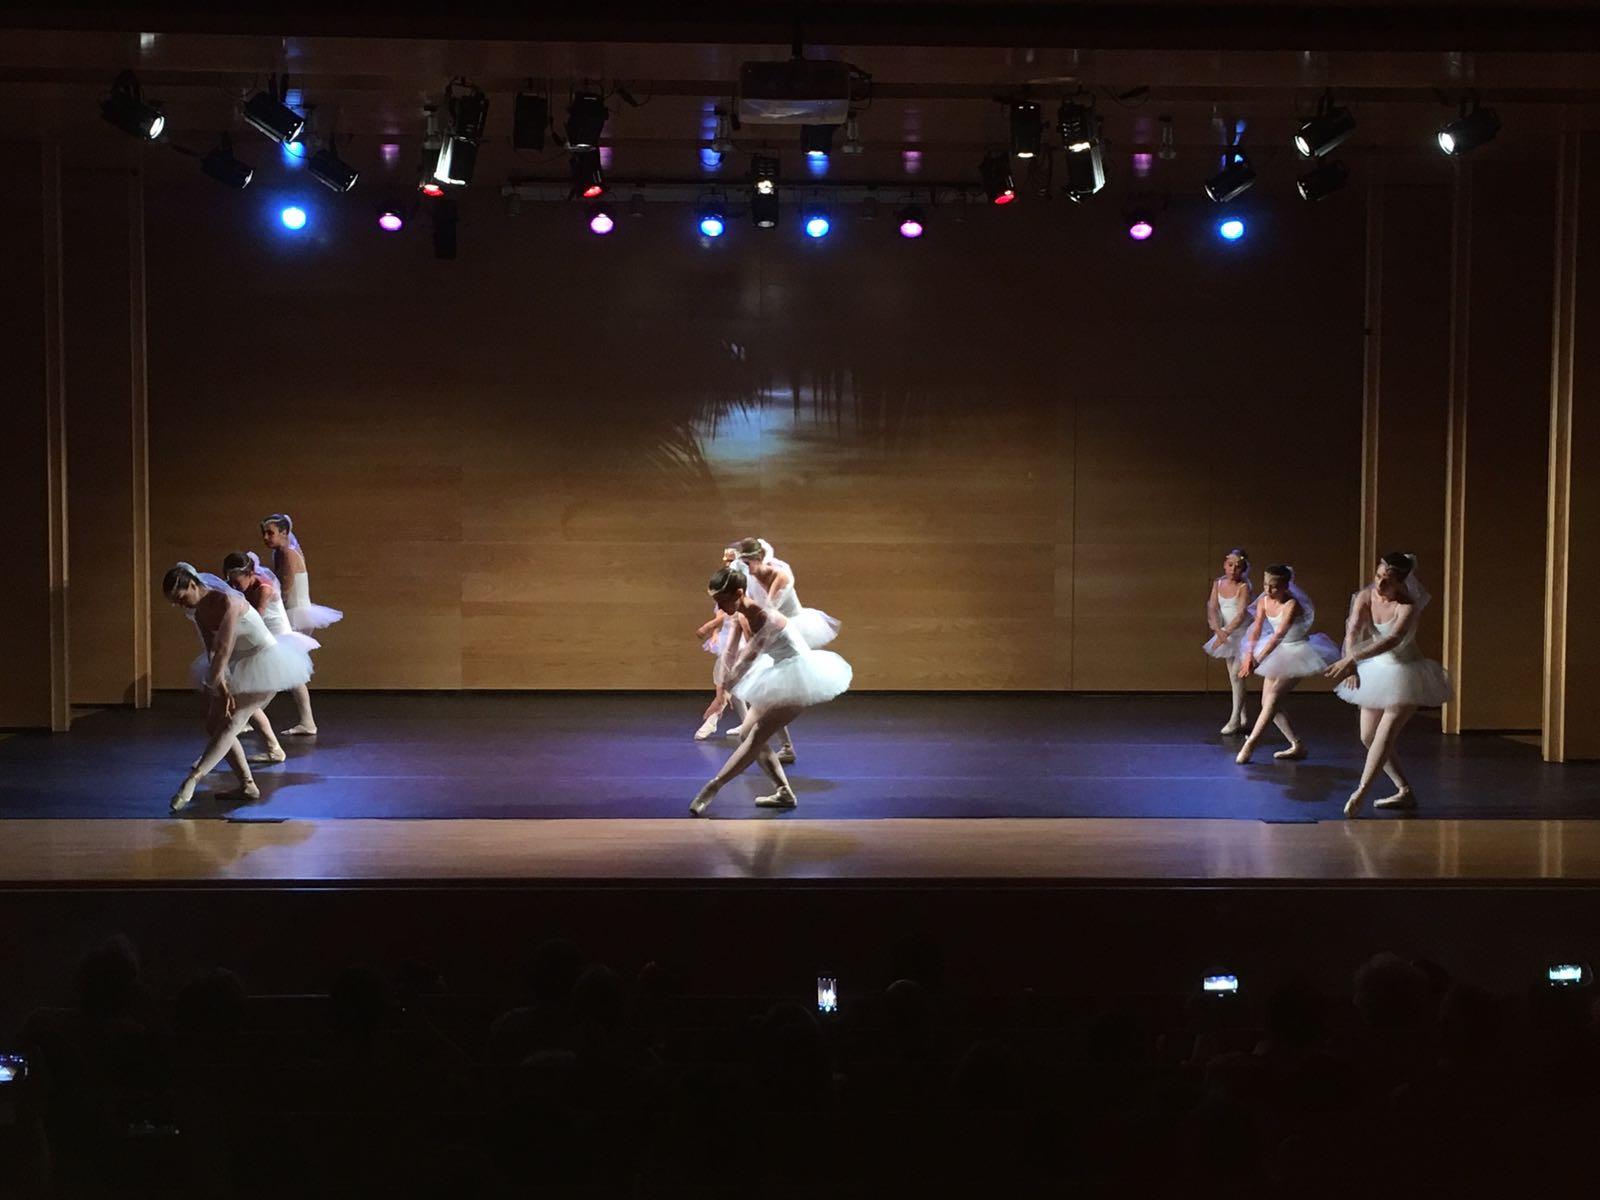 FESTIVAL DE BALLET LA BAYADERE (LEON MINKUS)